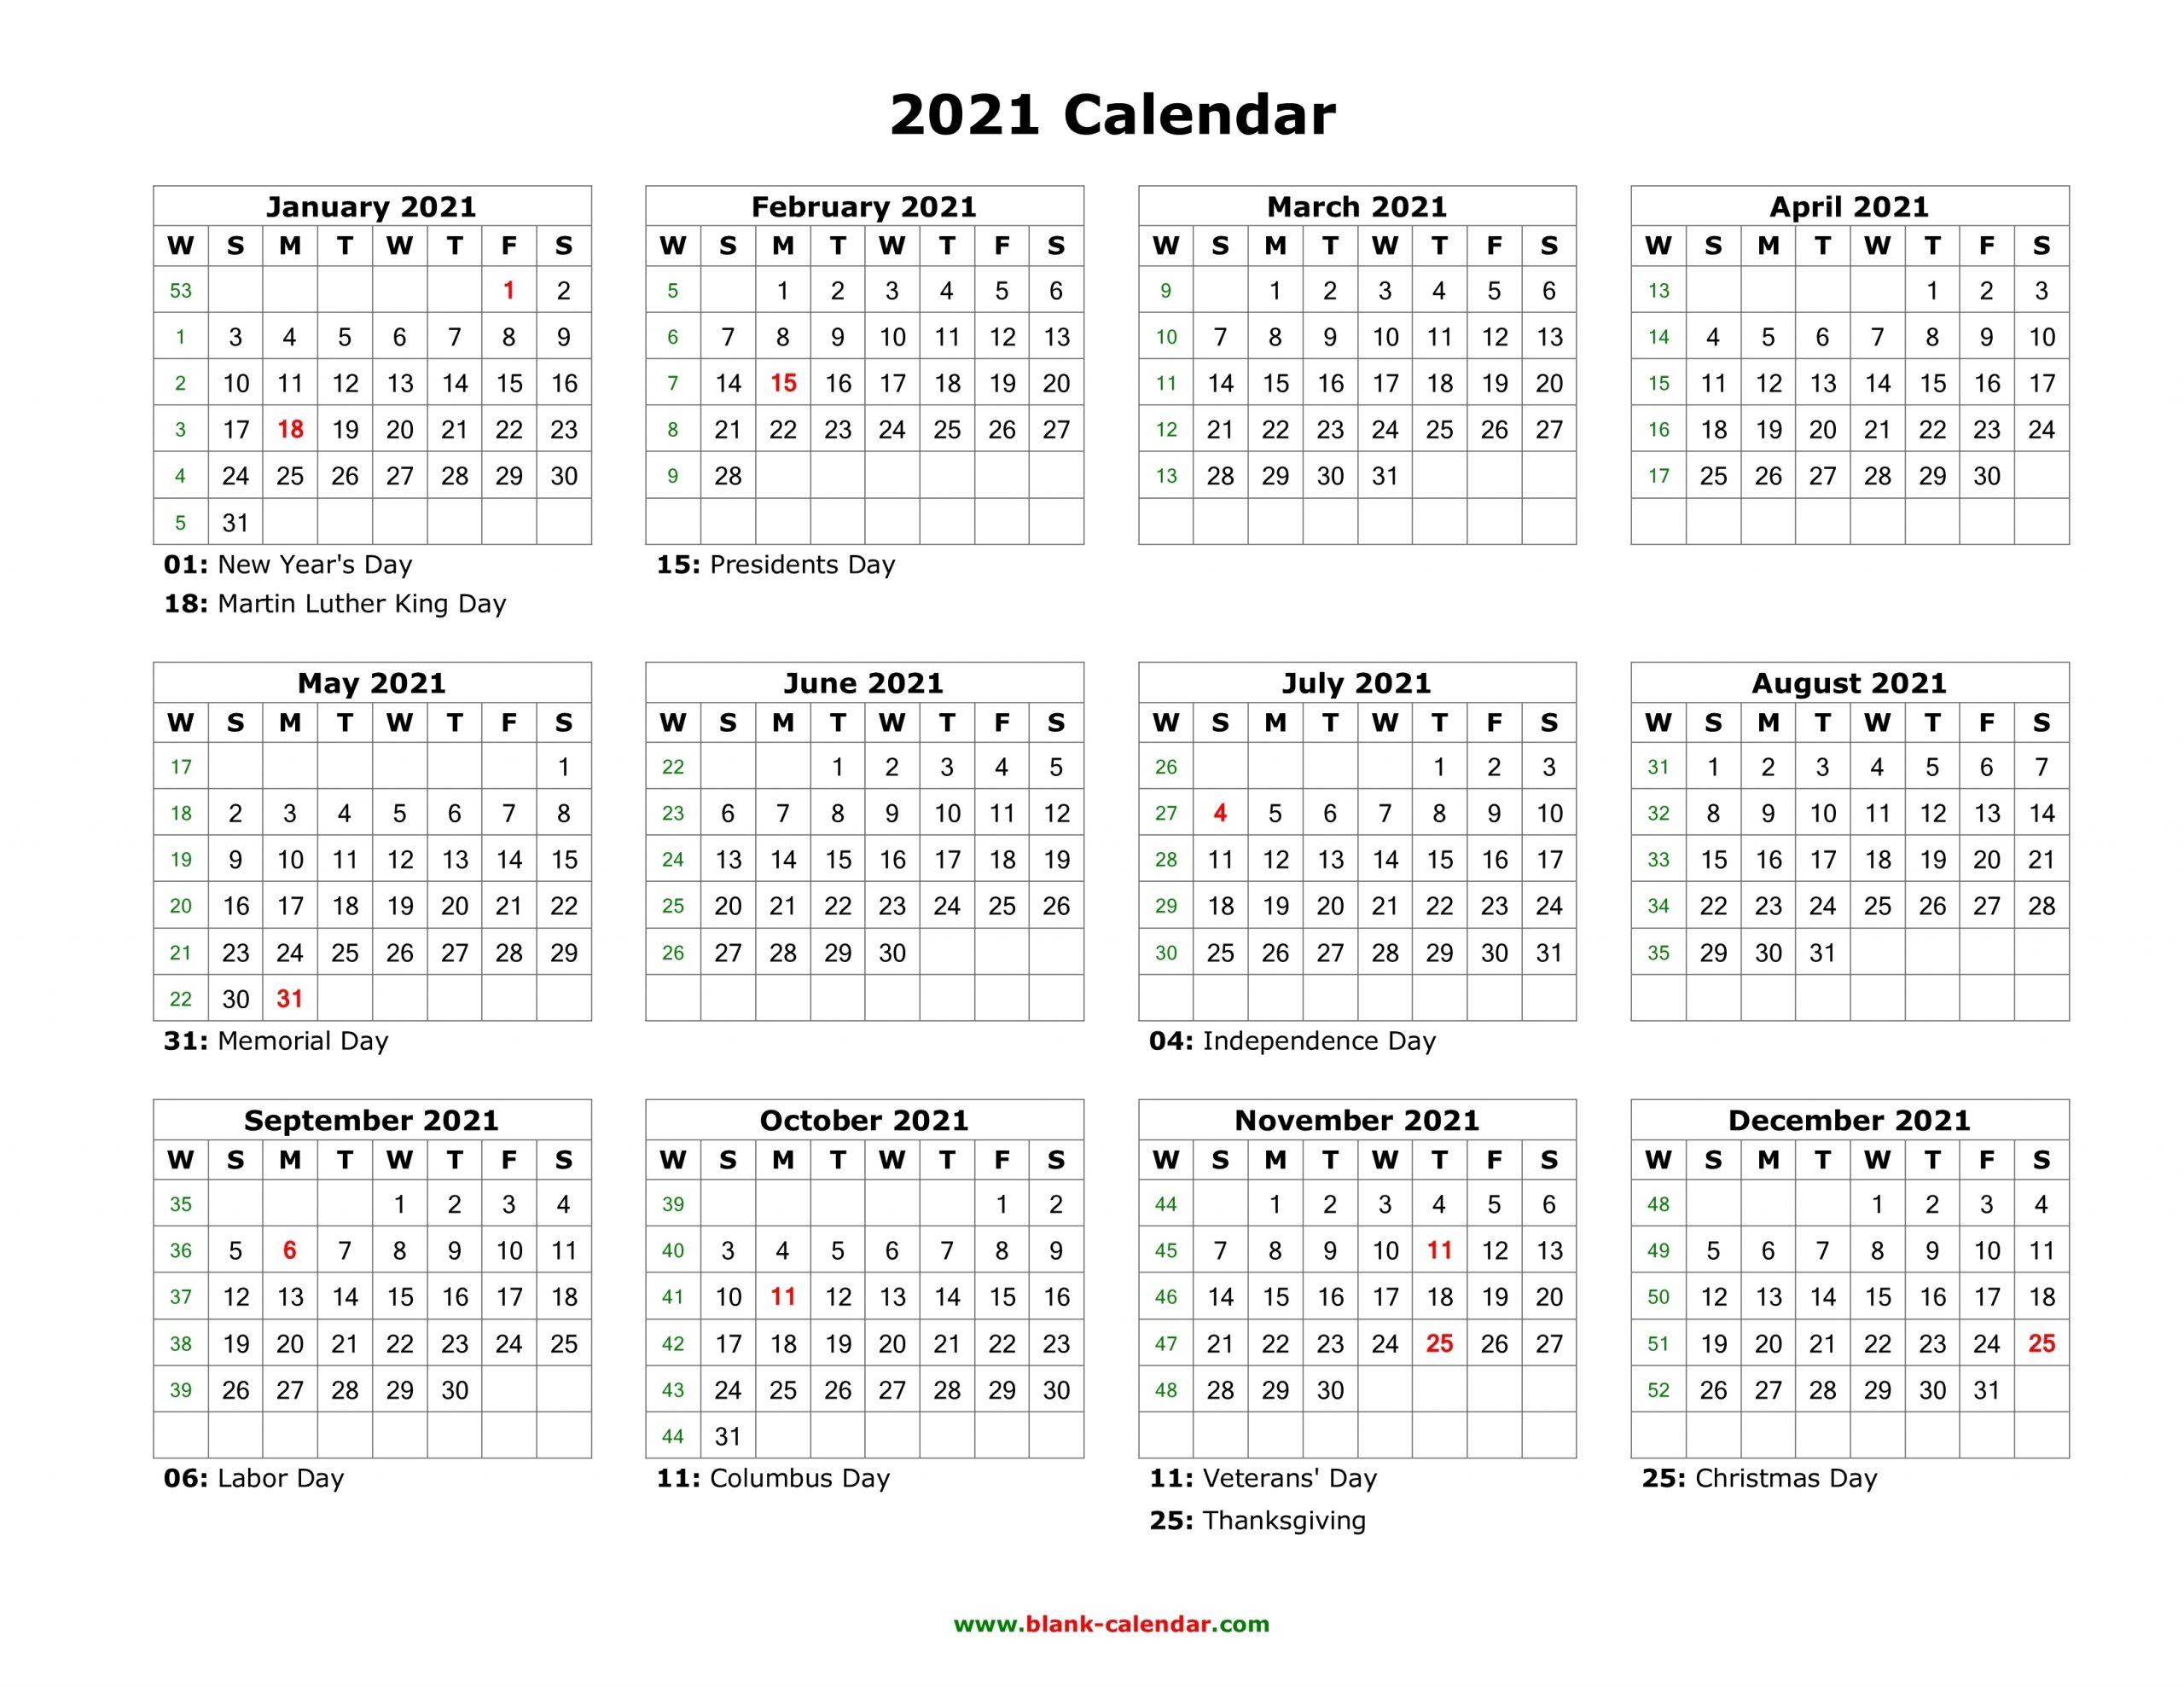 Catch Depo Provera Injection Calendar Printable 2021 for Depo Provera Injection Calendar 2021